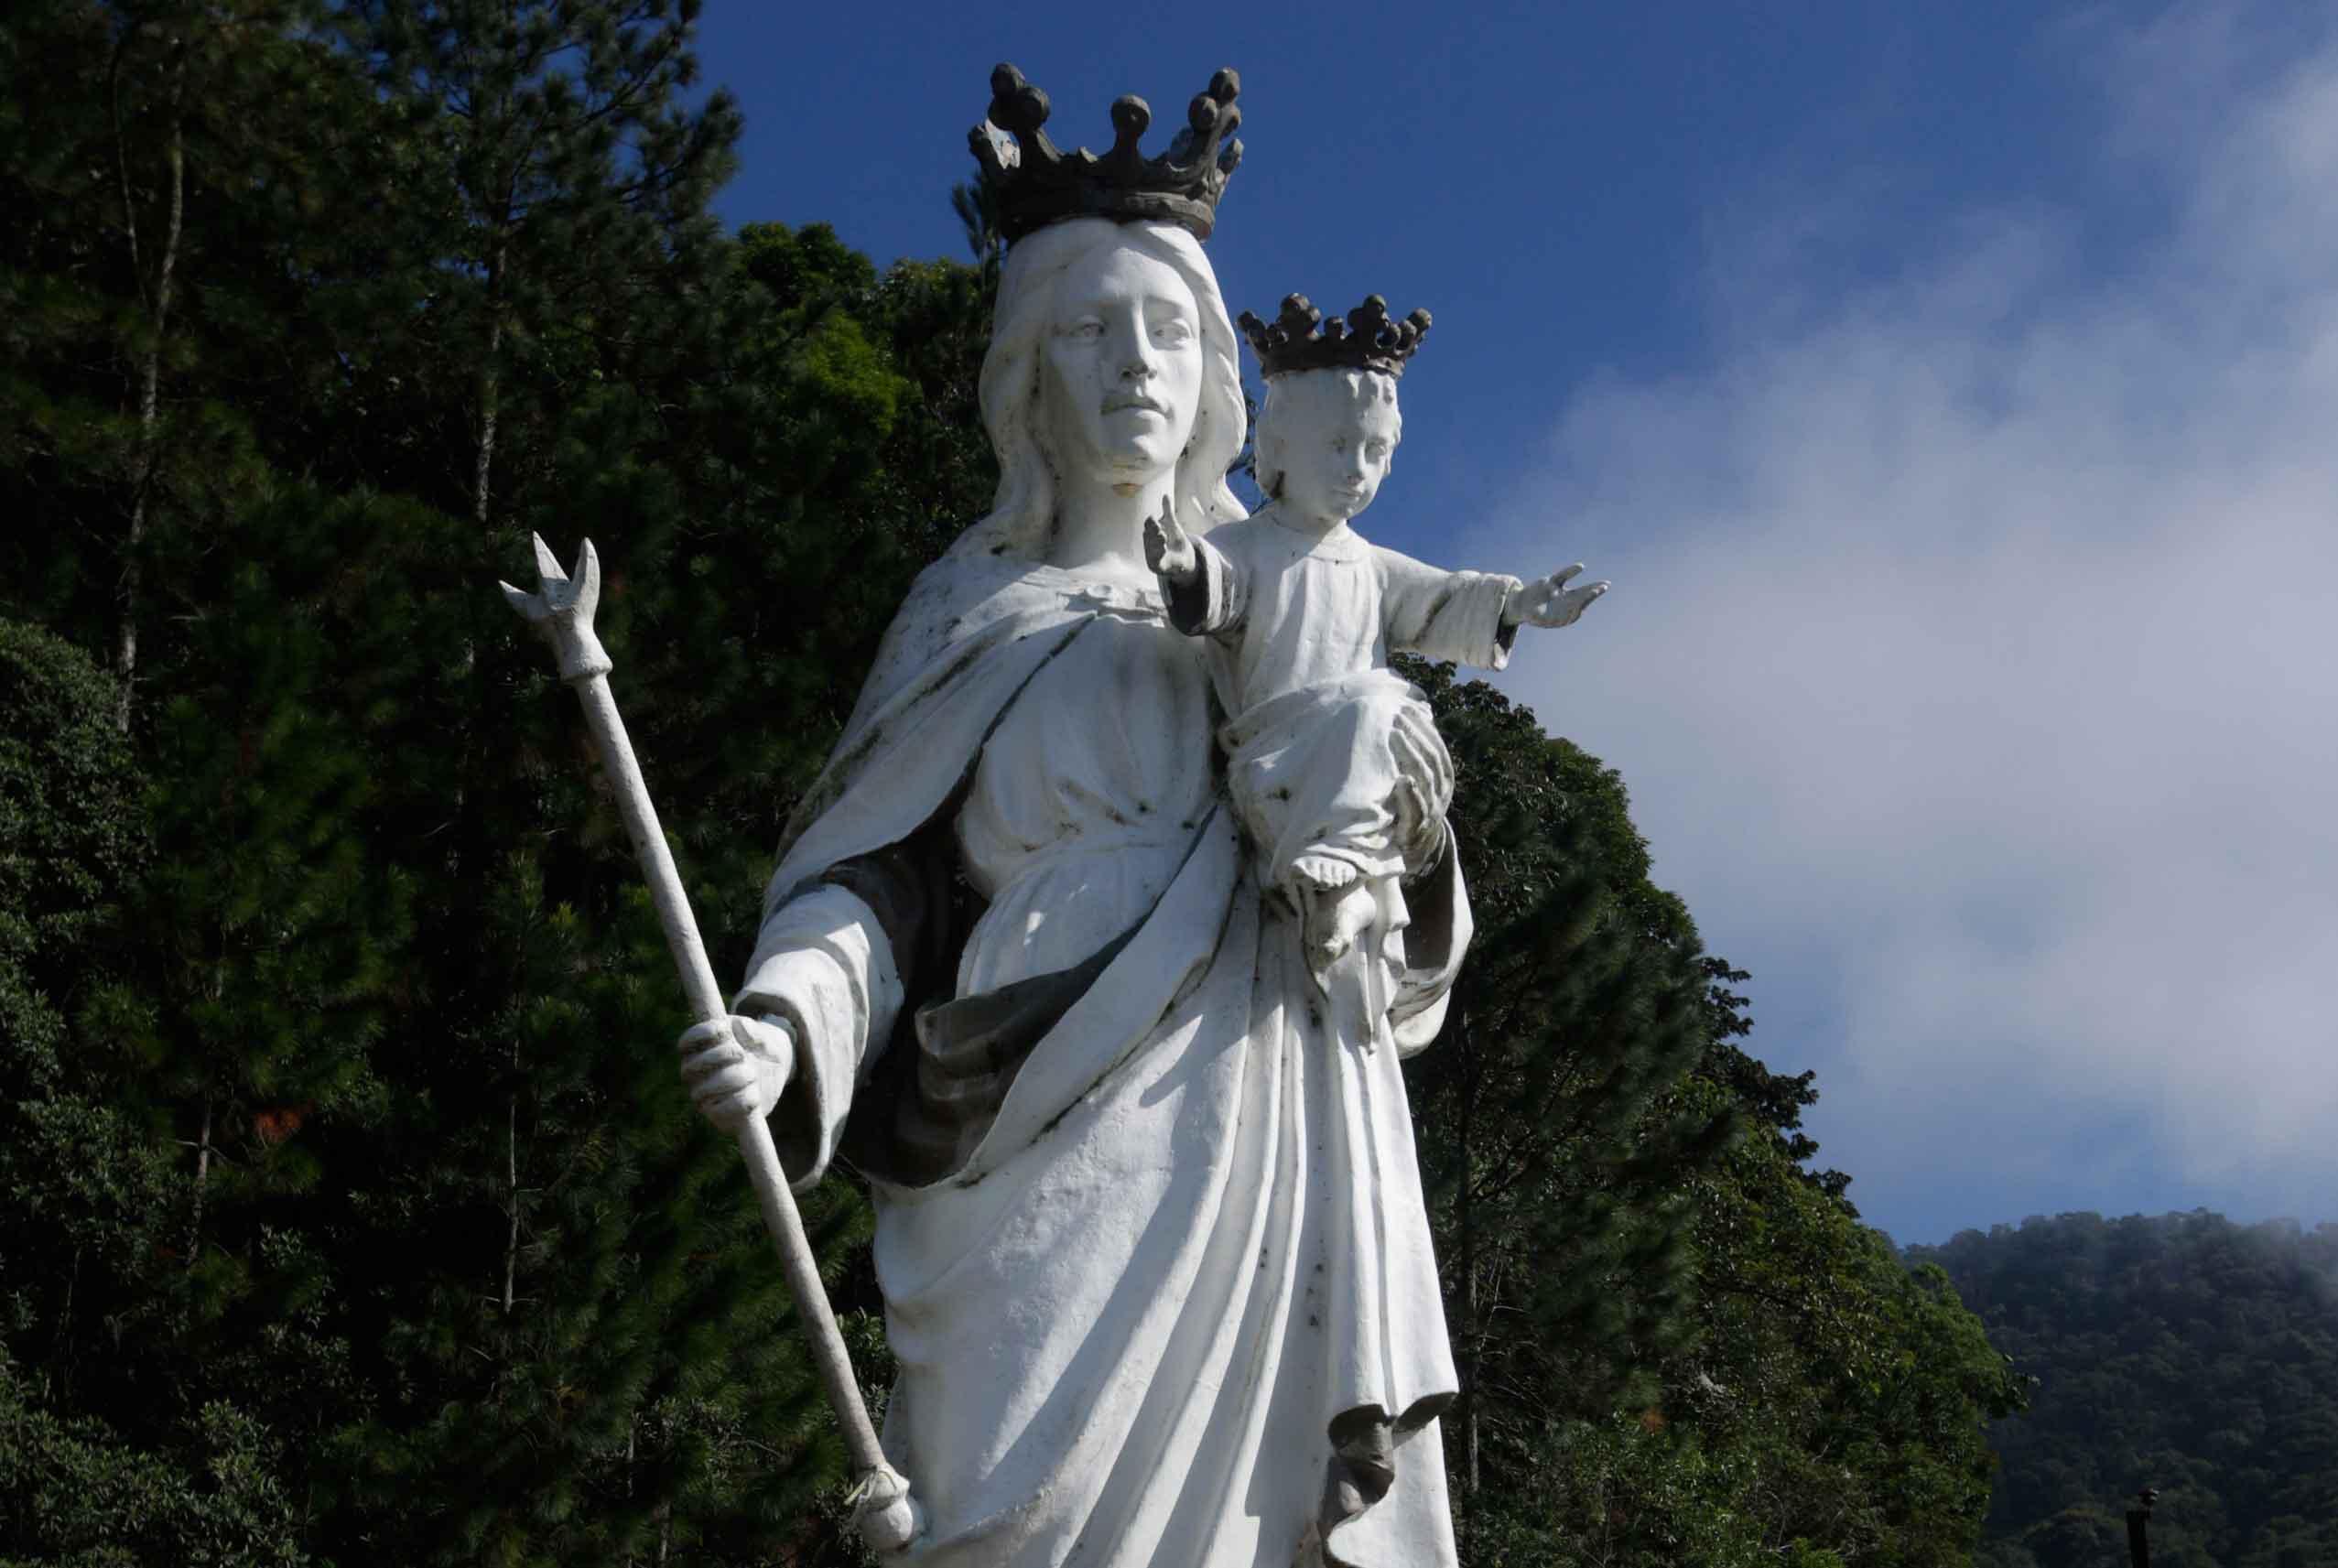 Mirante Nossa Senhora Auxiliadora-Santo-Antonio-do-Pinhal-Turismo-Religioso-Mirante-NSra-Auxiliadora-_MG_5767-C-bx